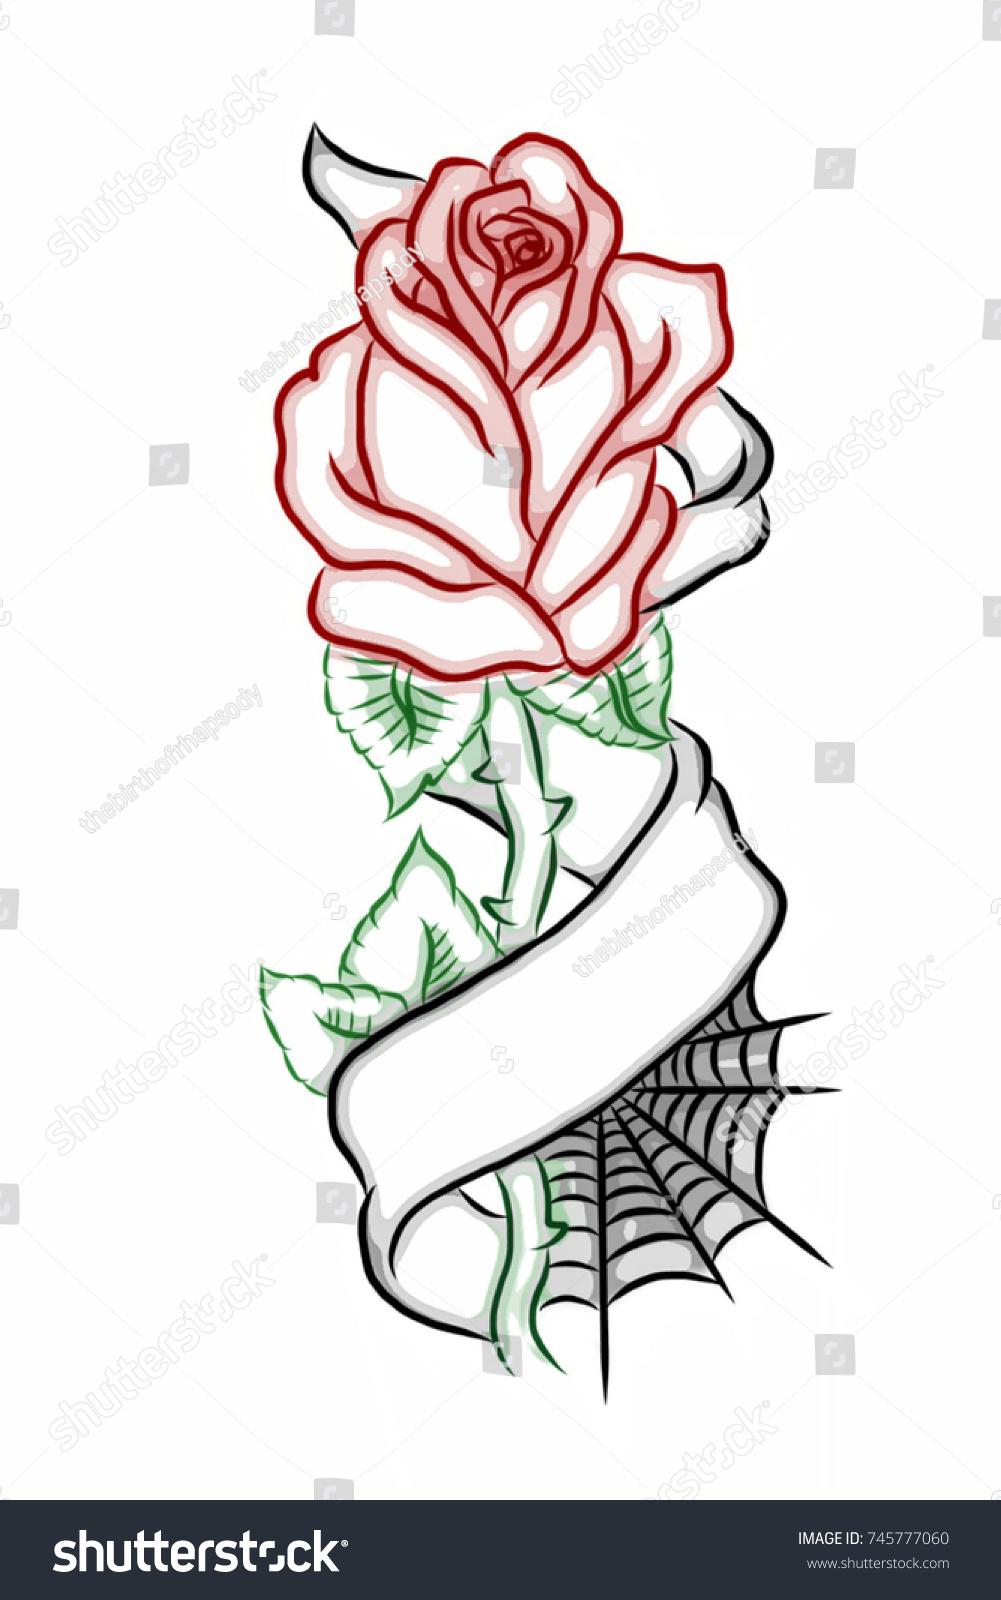 Royalty Free Stock Illustration Of 3 D Digitally Illustrated Rose